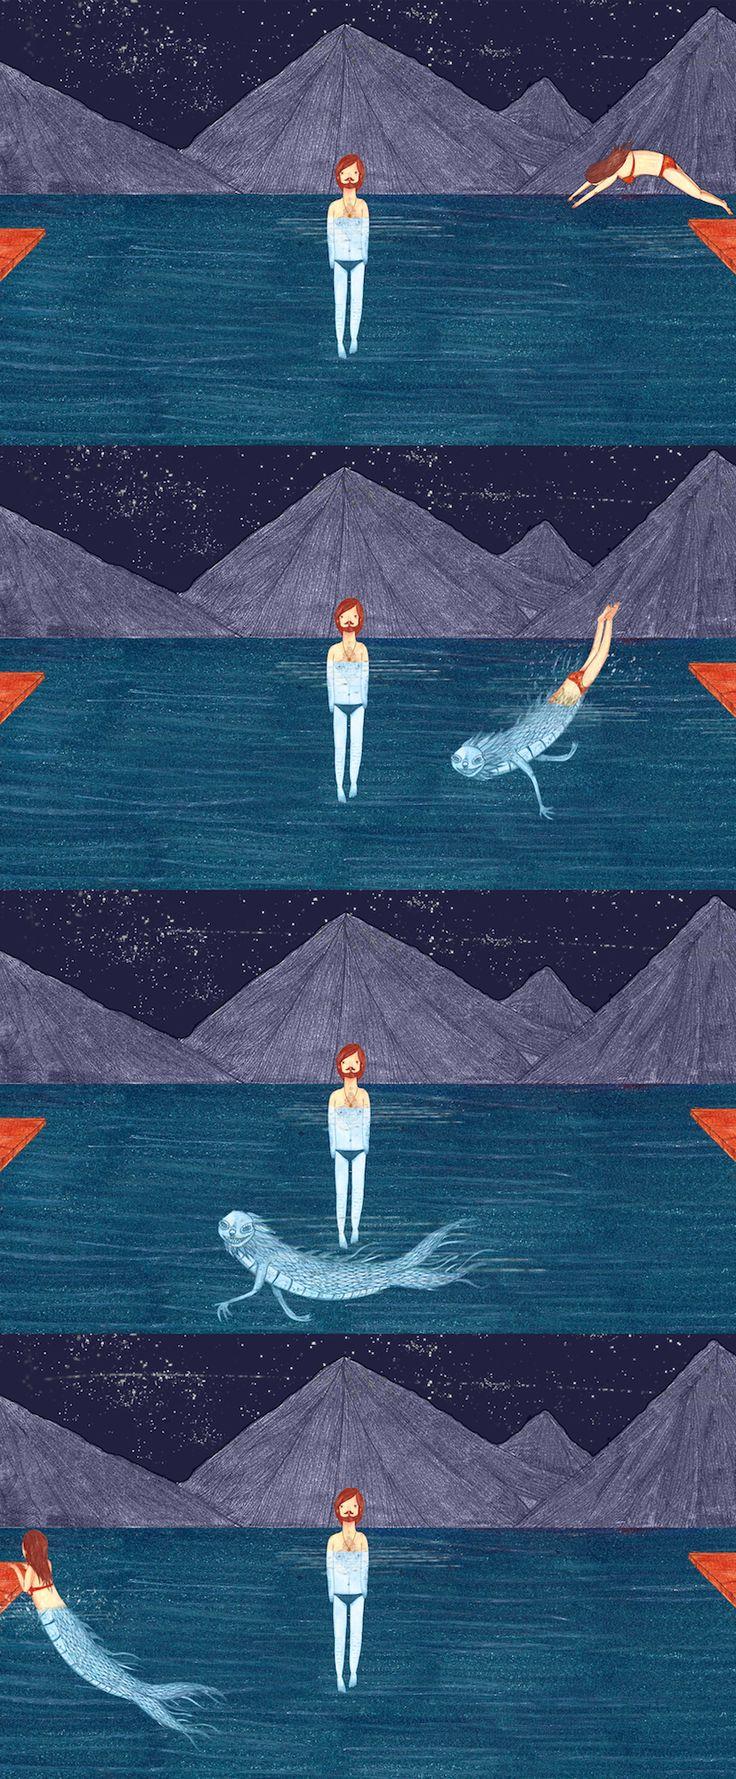 'Freak Underwater' first published in Creaturemag, May 2012 - David Litchfield